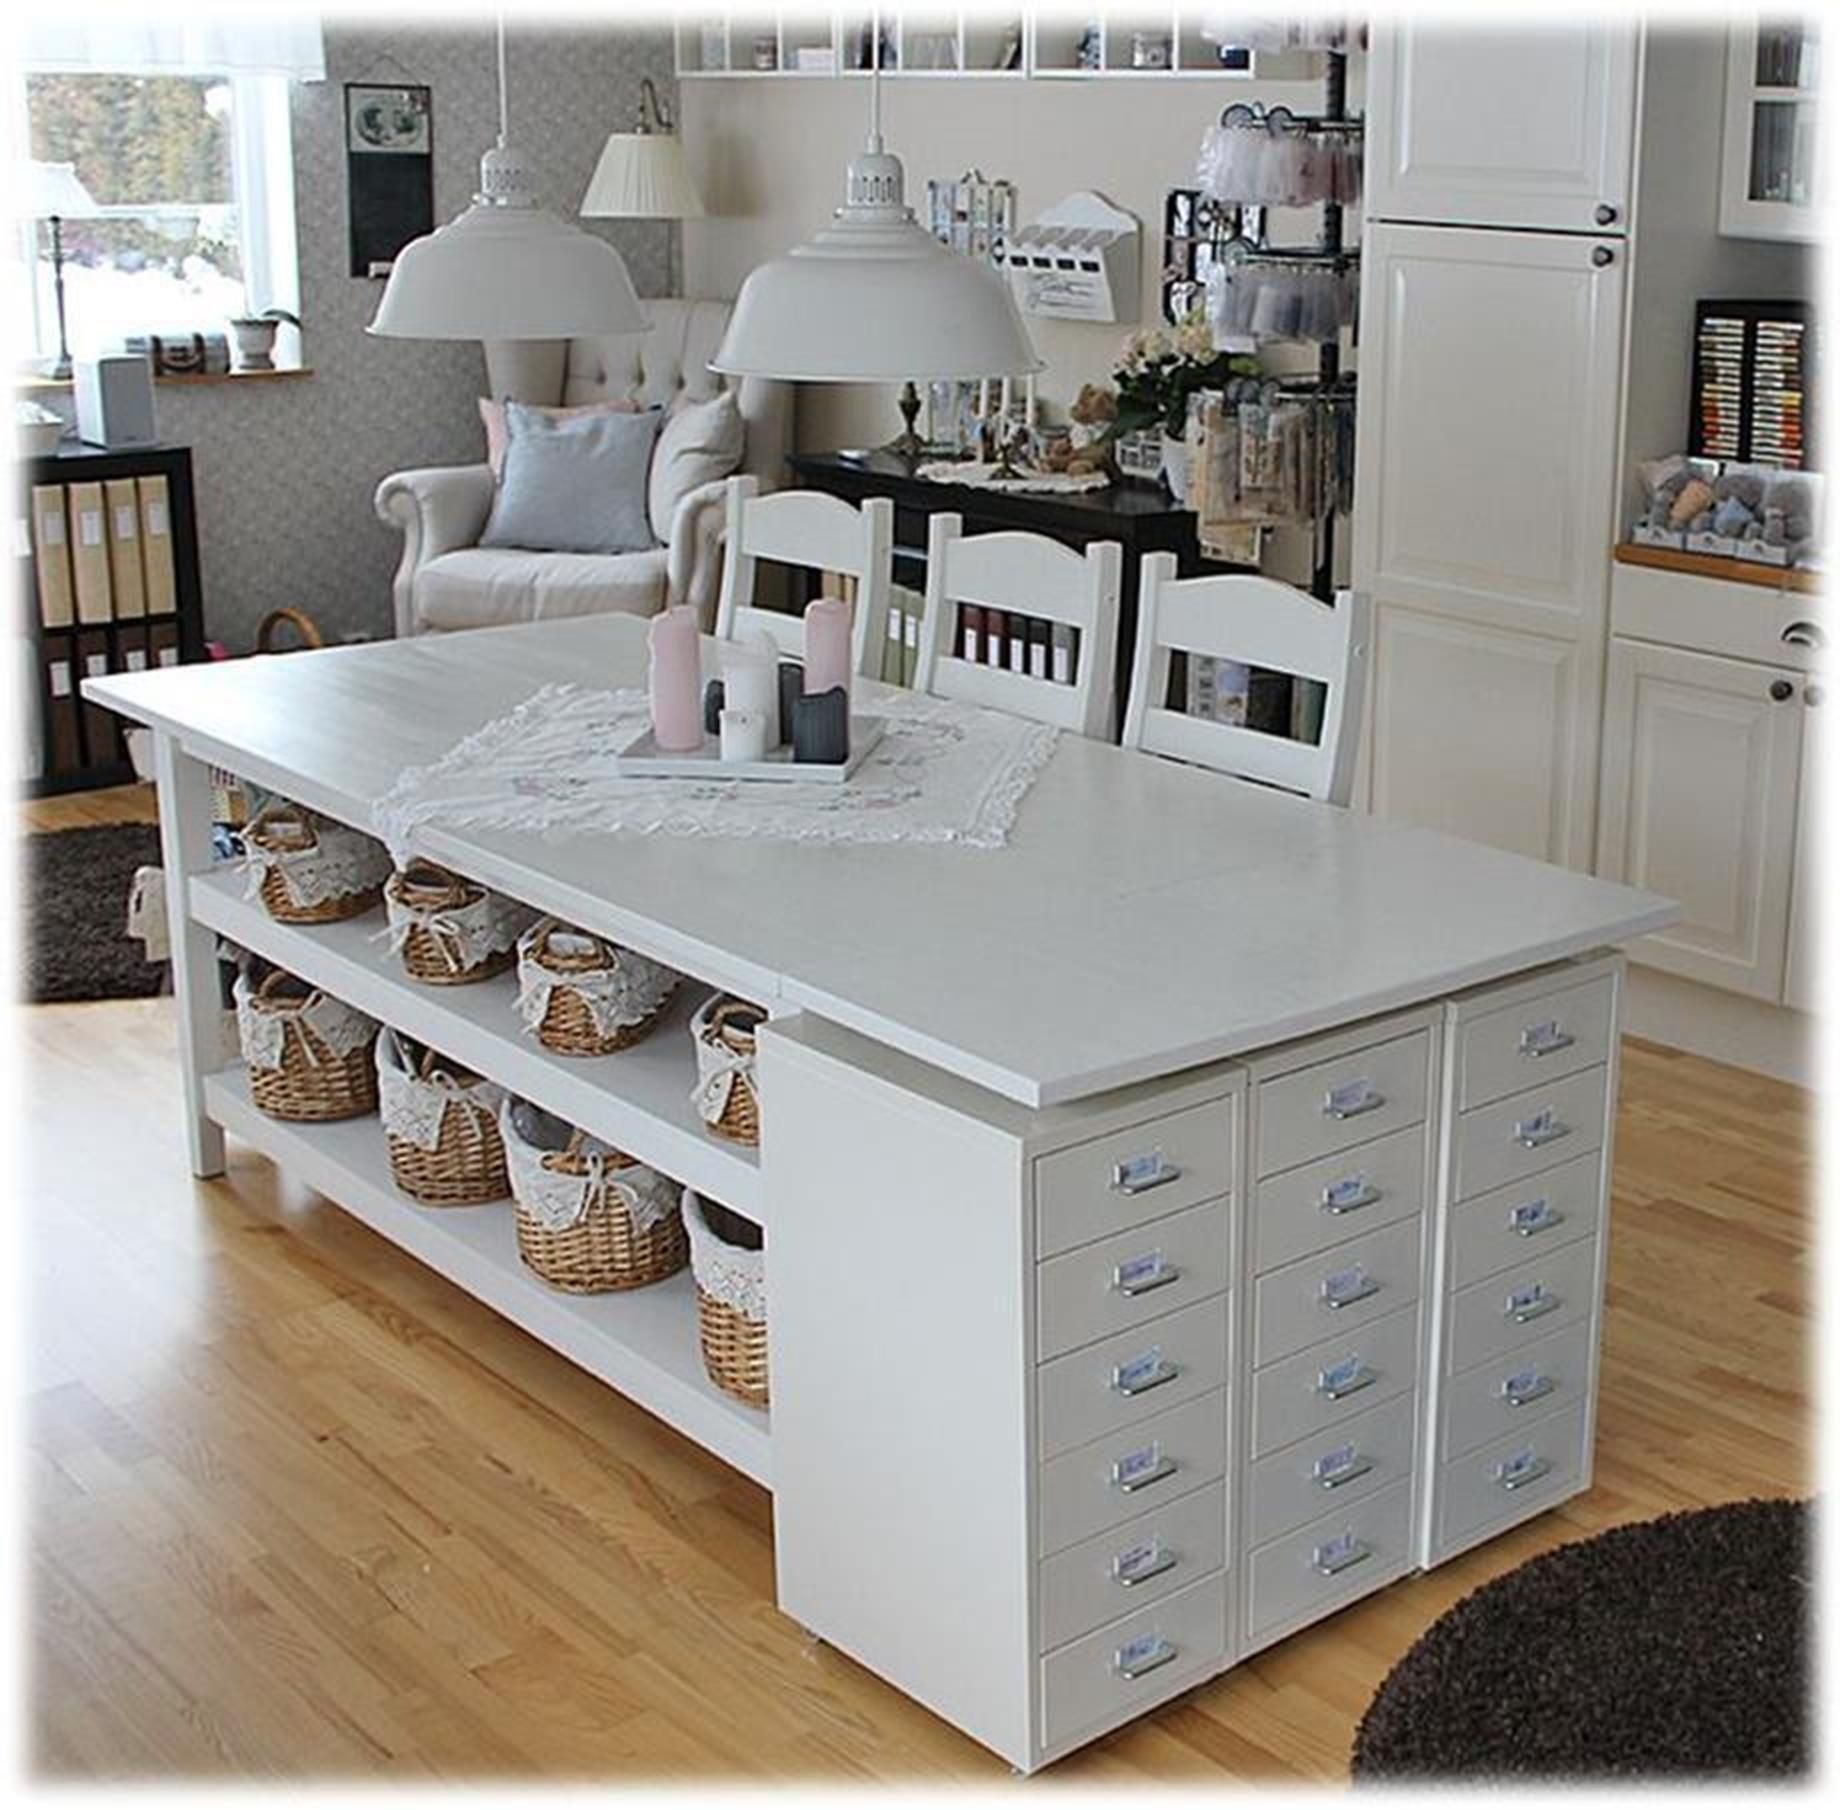 20 Best Craft Room Storage And Organization Furniture Ideas 16 Craft Tables With Storage Craft Room Design Craft Room Storage